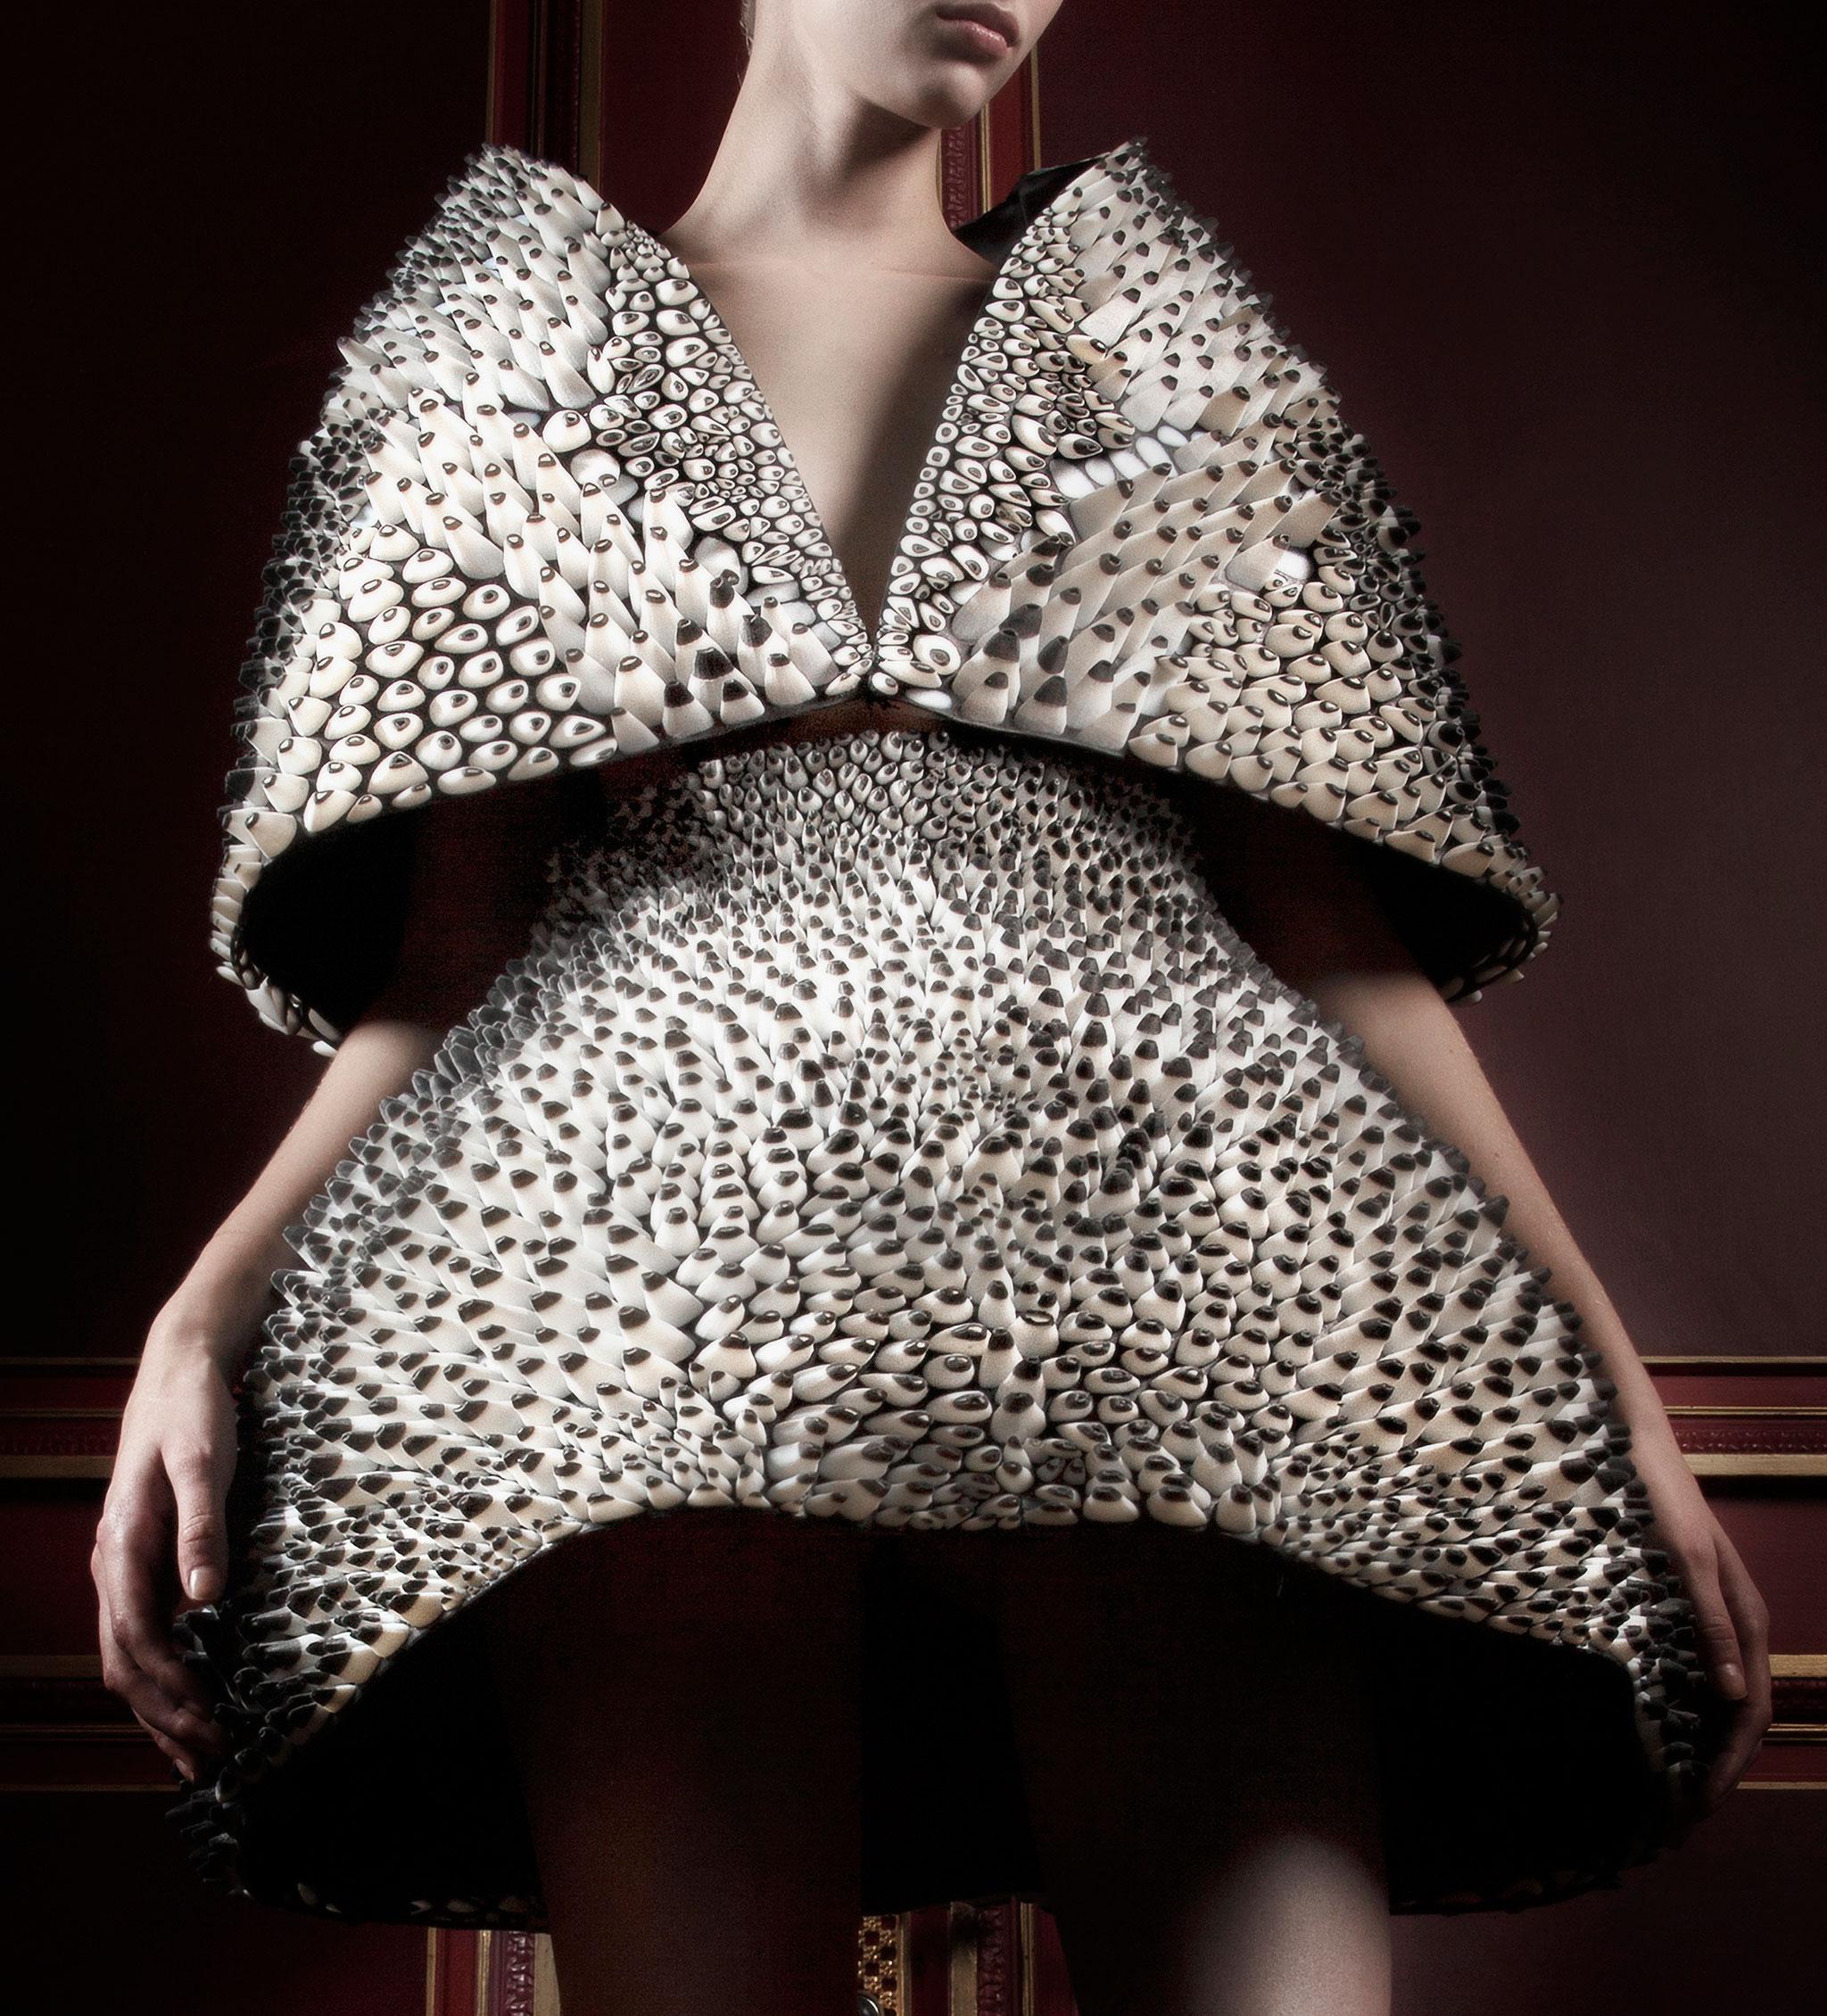 3D-Printed-Neri-Oxman-Iris-van-Herpen-Anthozoa-Cape-Skirt-2